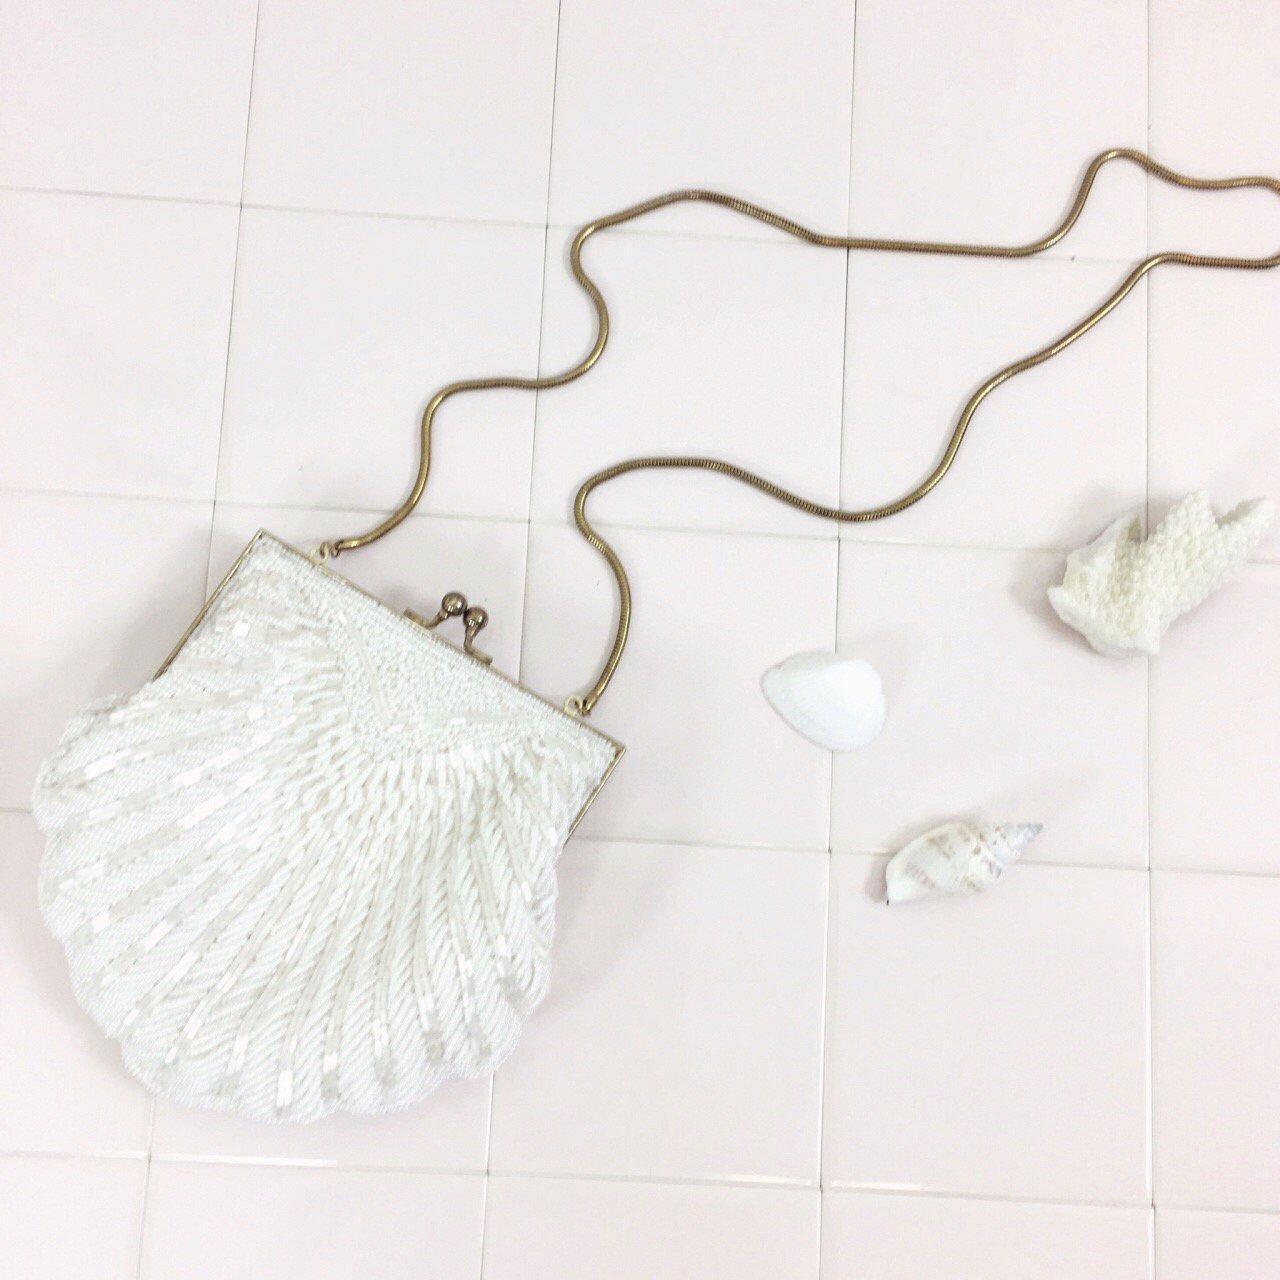 vintage white shell beads bag